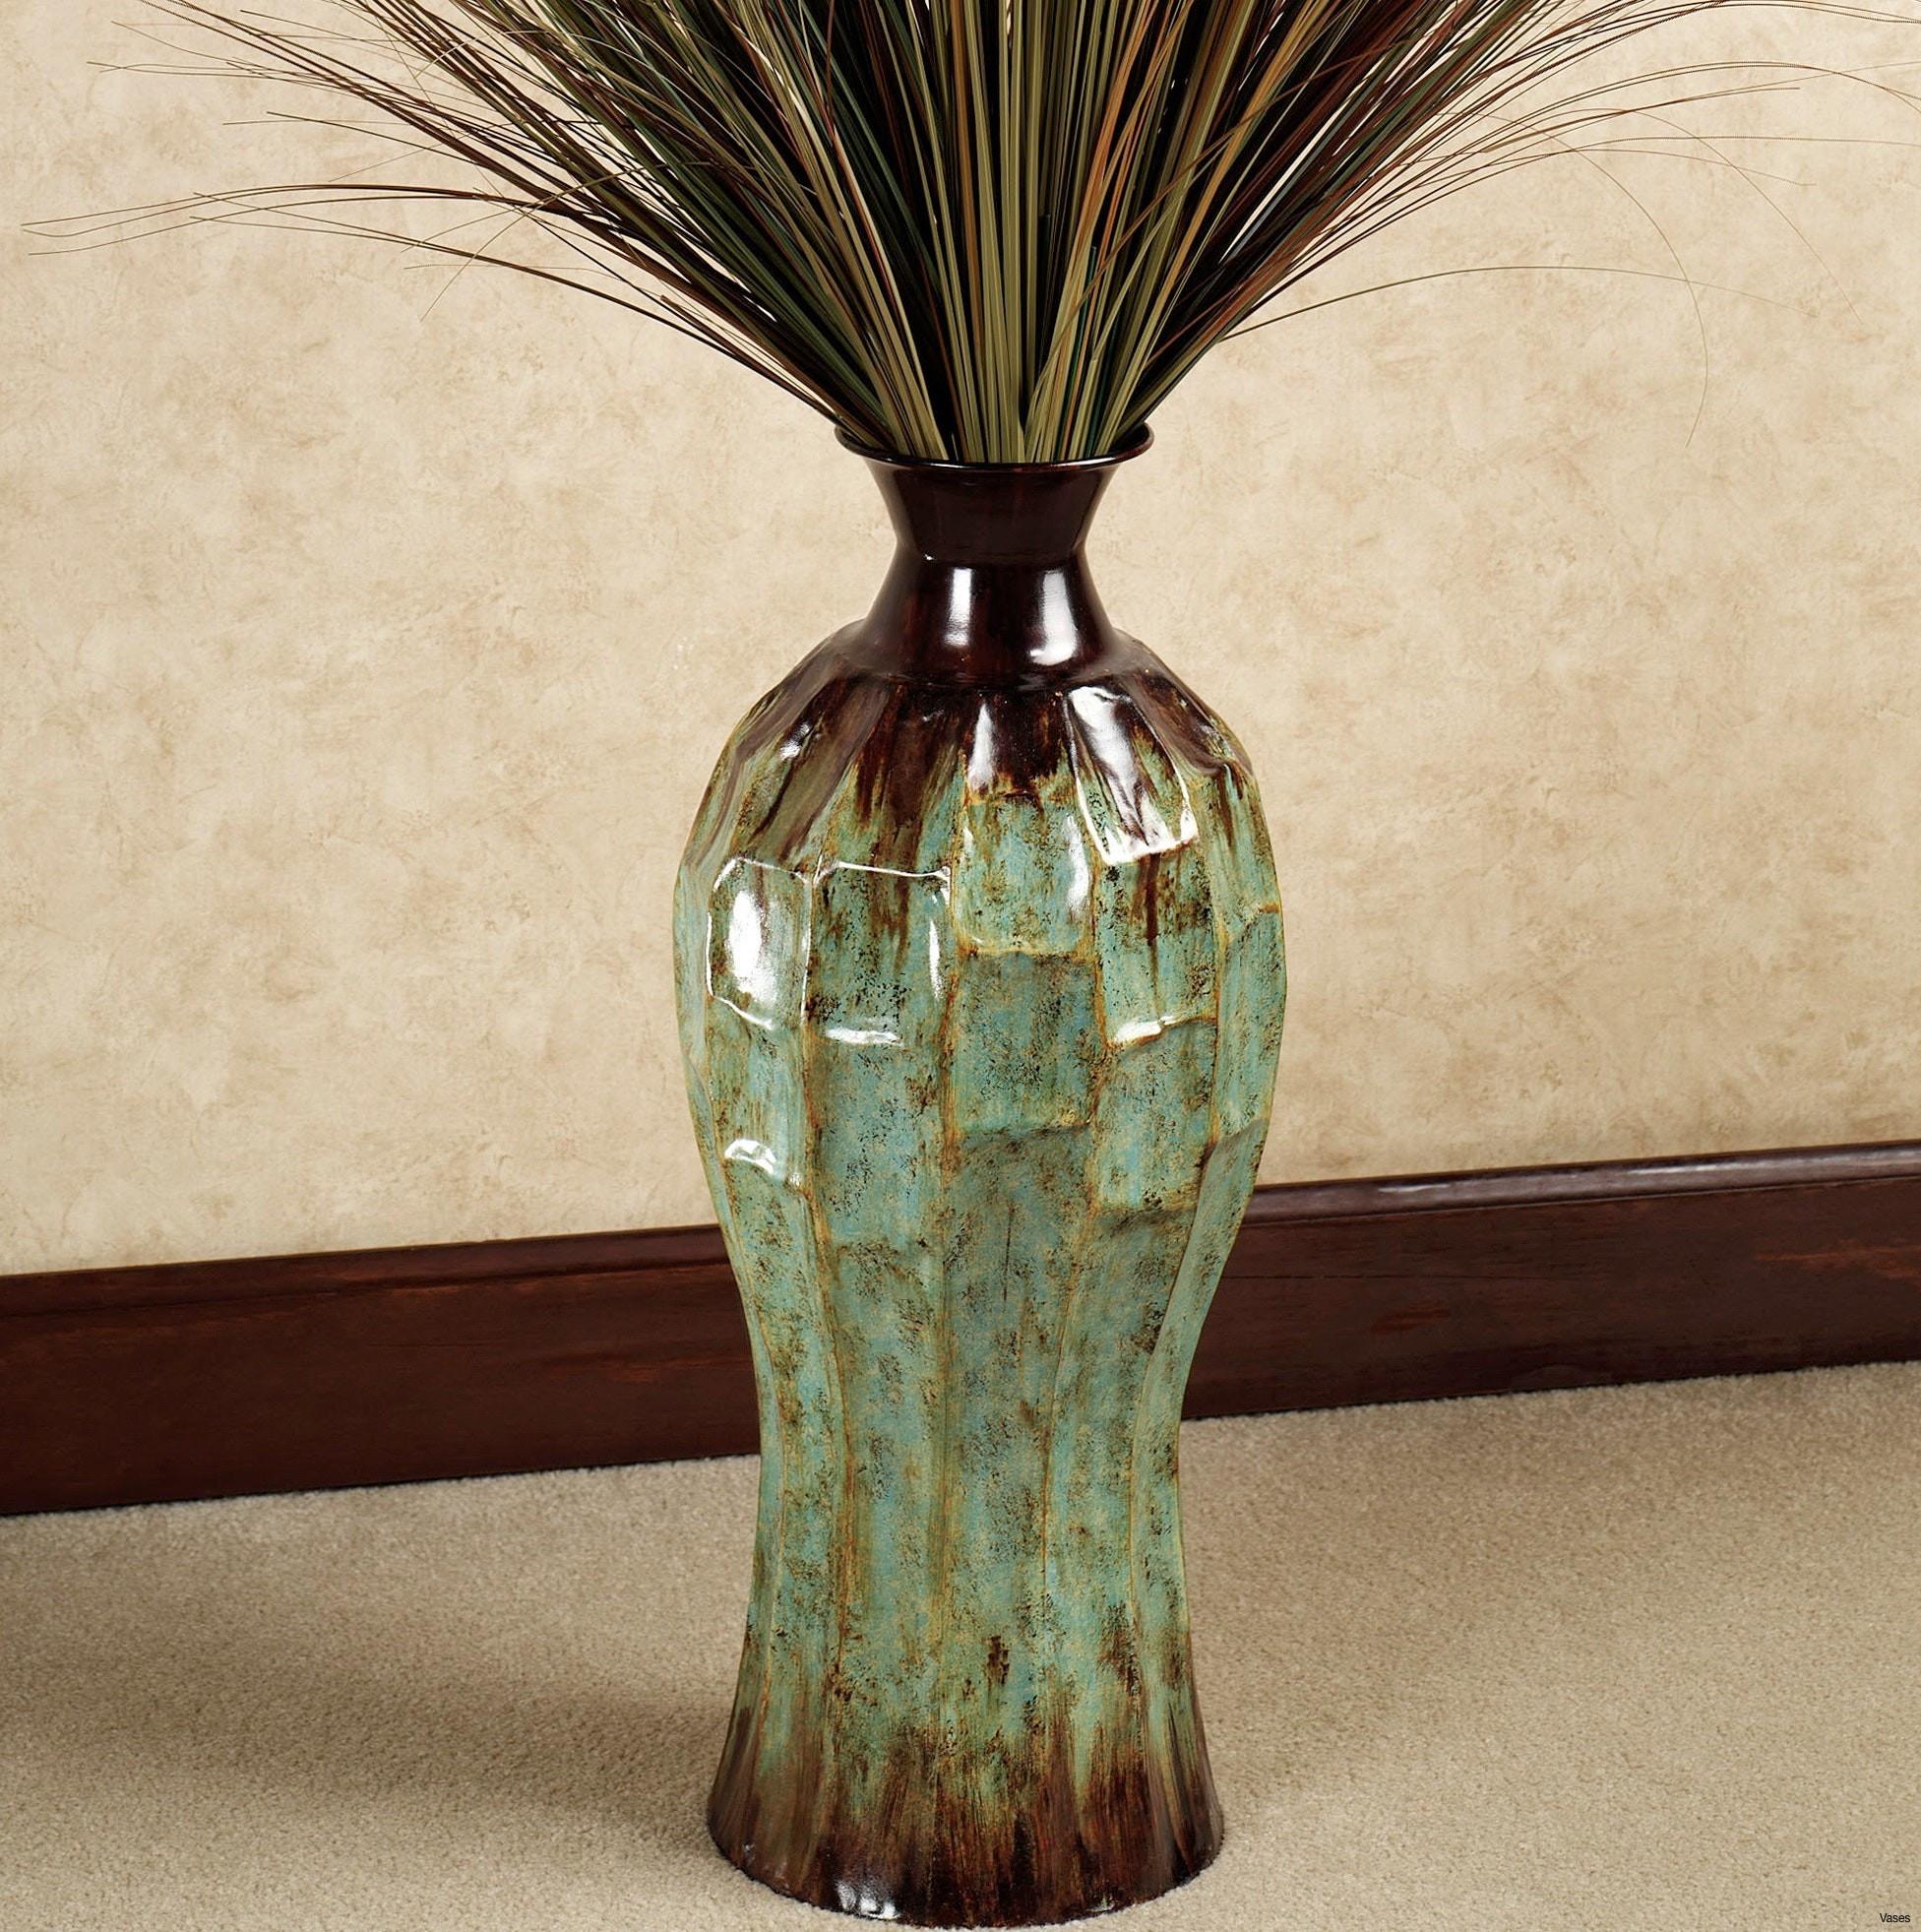 white vase filler of decorating ideas for tall vases fresh floor vase filler ideas with decorating ideas for tall vases fresh floor vase filler ideas decorationh vases tall decorating i 8d